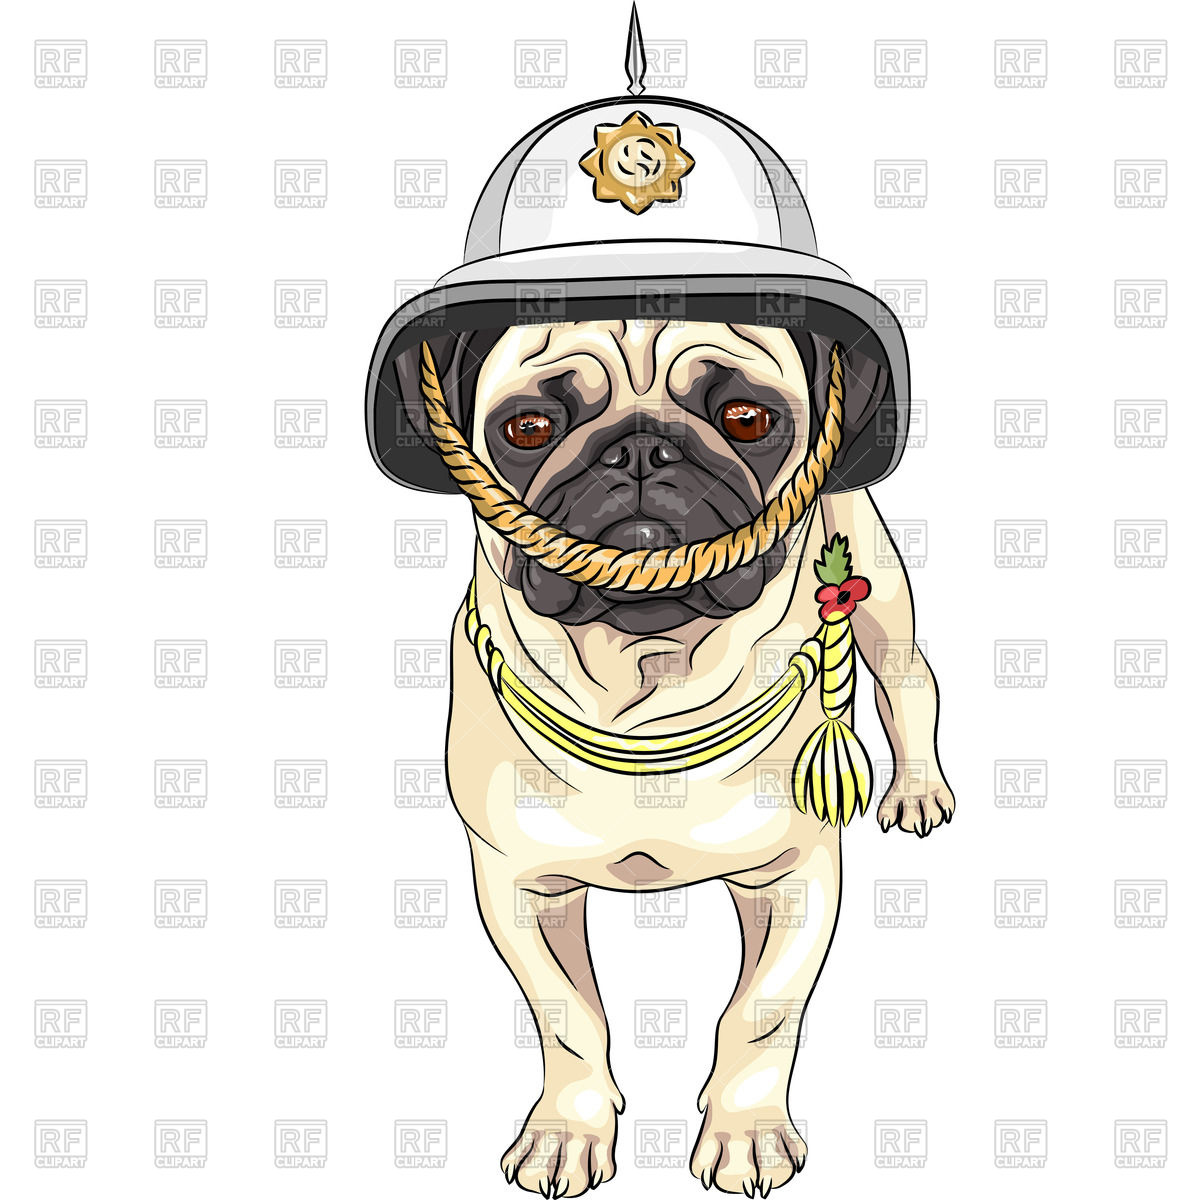 1200x1200 Serious Dog In The British Helmet